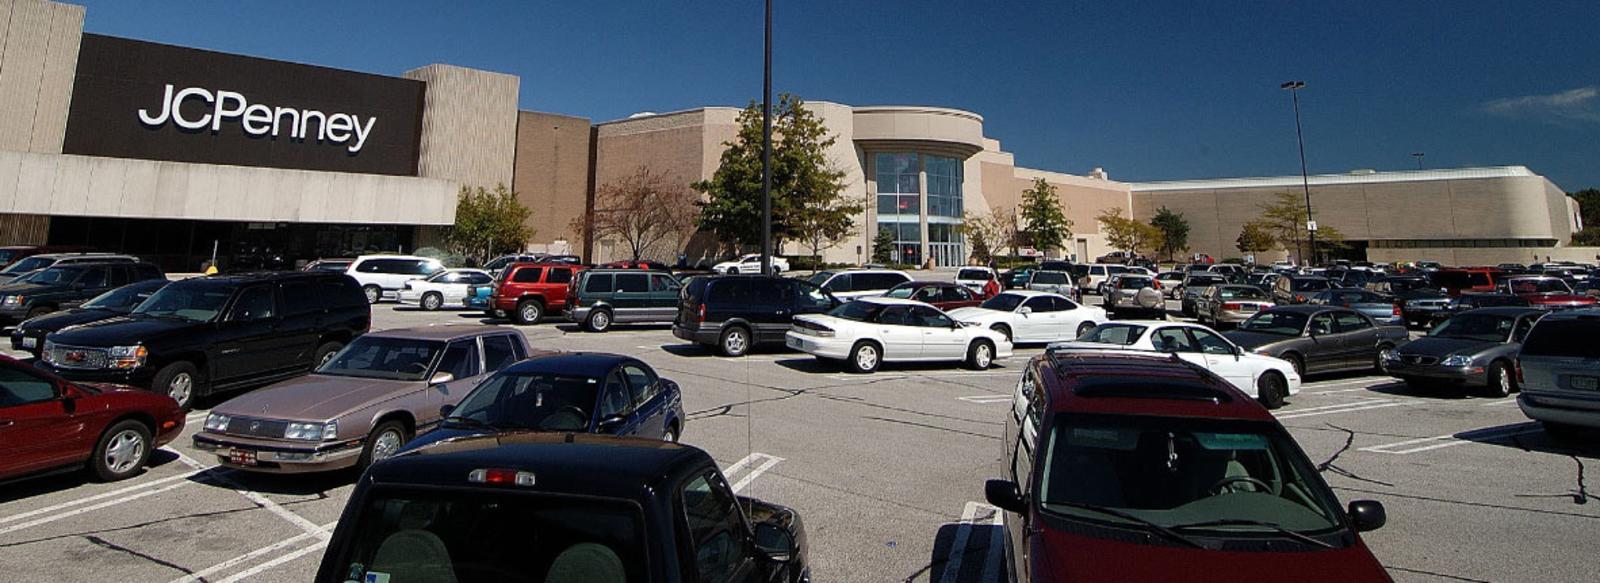 Southlake Mall Shopping - Merrillville, Indiana